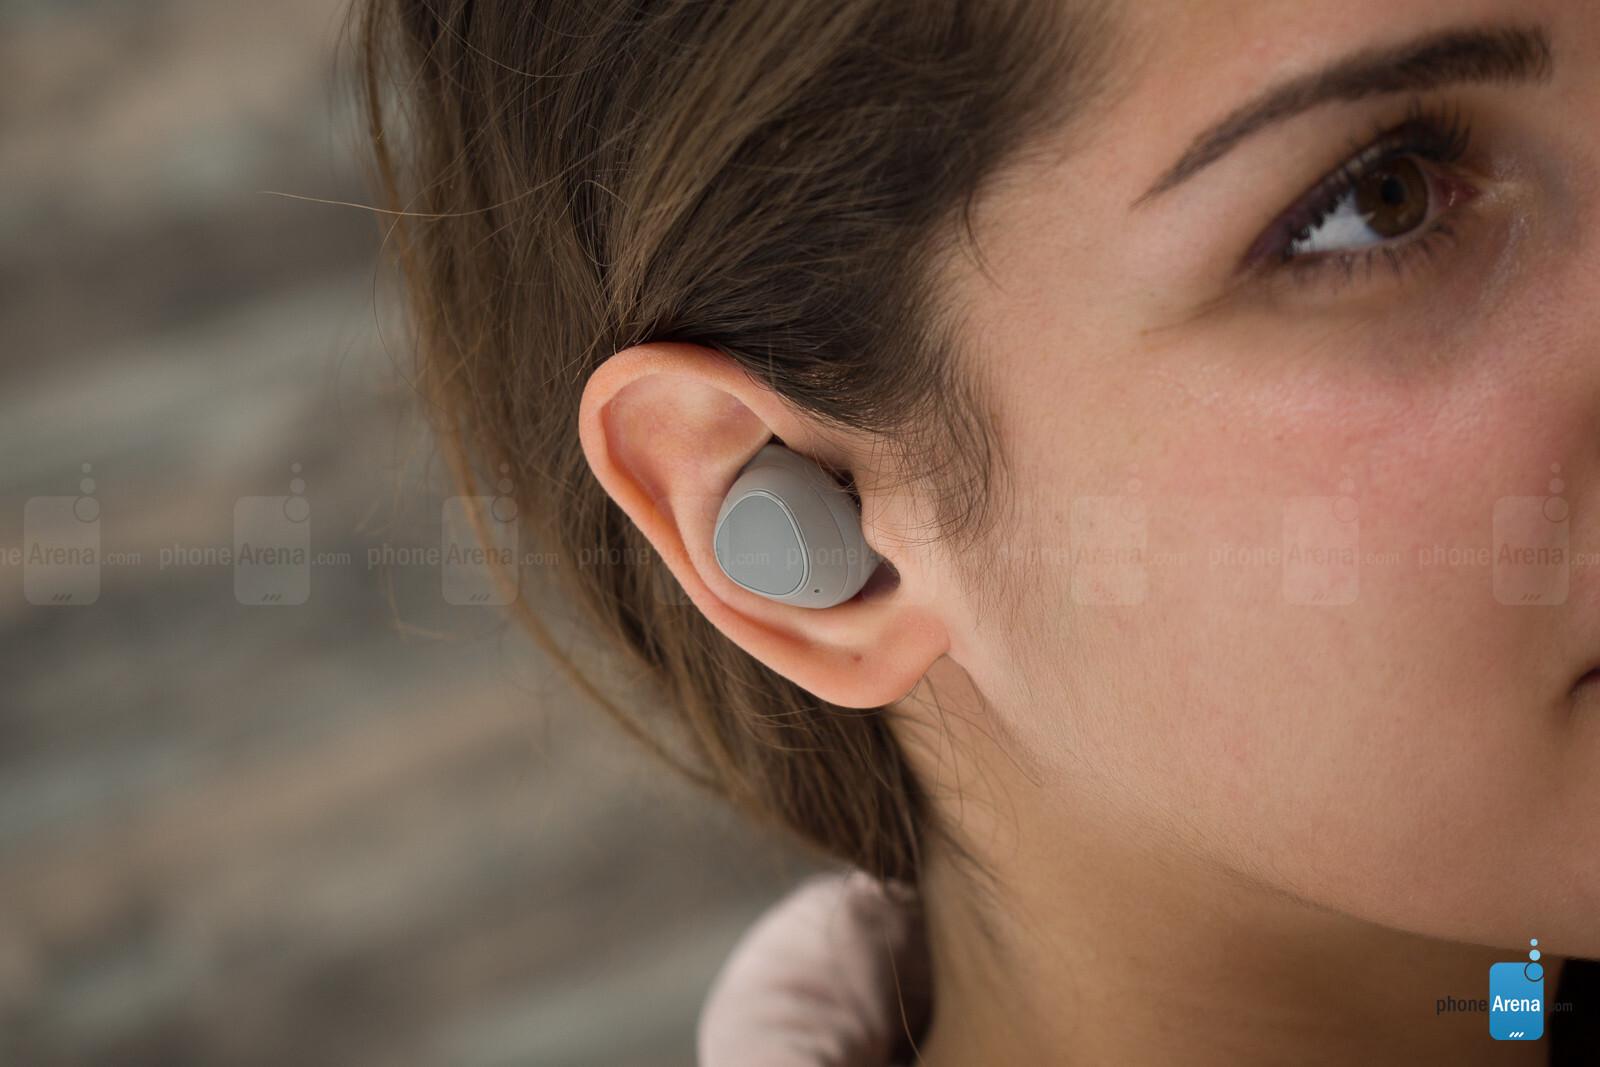 b1cd5cb4b2e Samsung Gear IconX 2018 wireless headphones Review - PhoneArena